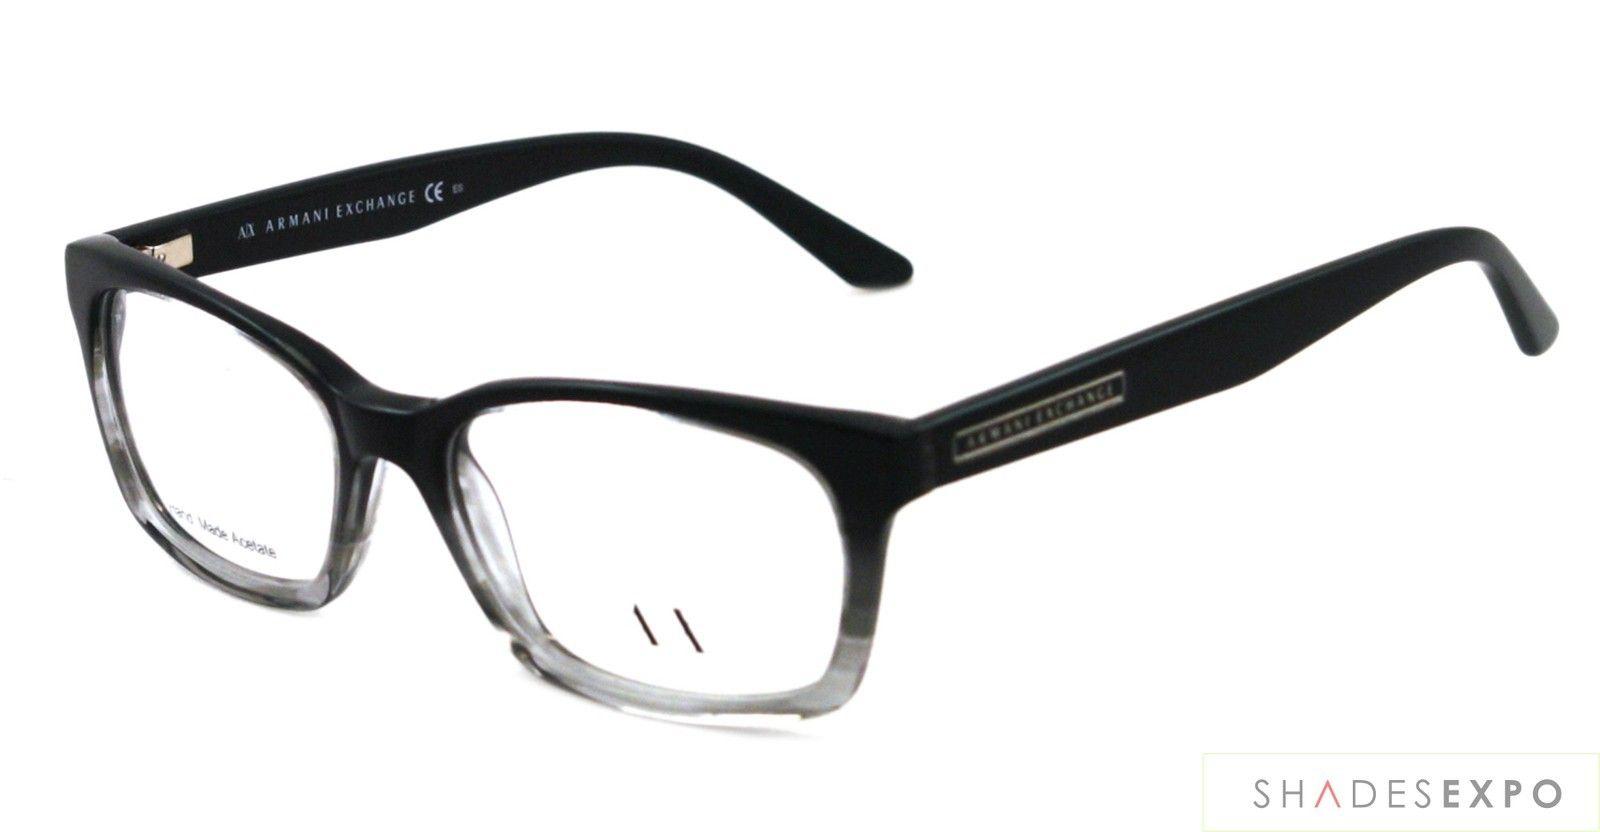 32af06d53e NEW Armani Exchange Eyeglasses AX 232 BLACK E4S AX232 AUTH ...